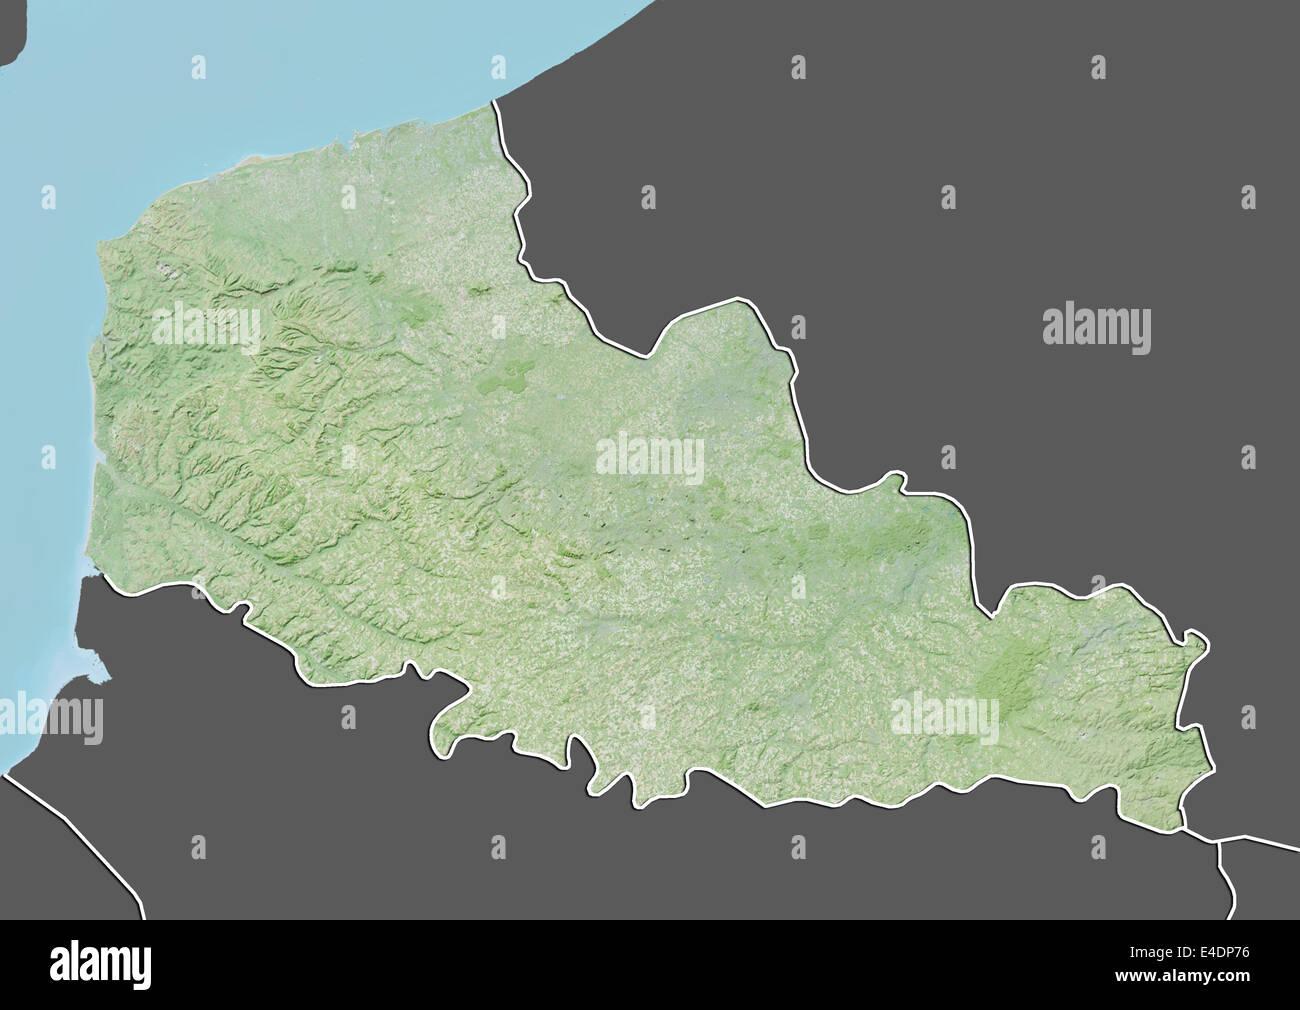 Map Of France Calais.Region Of Nord Pas De Calais France Relief Map Stock Photo